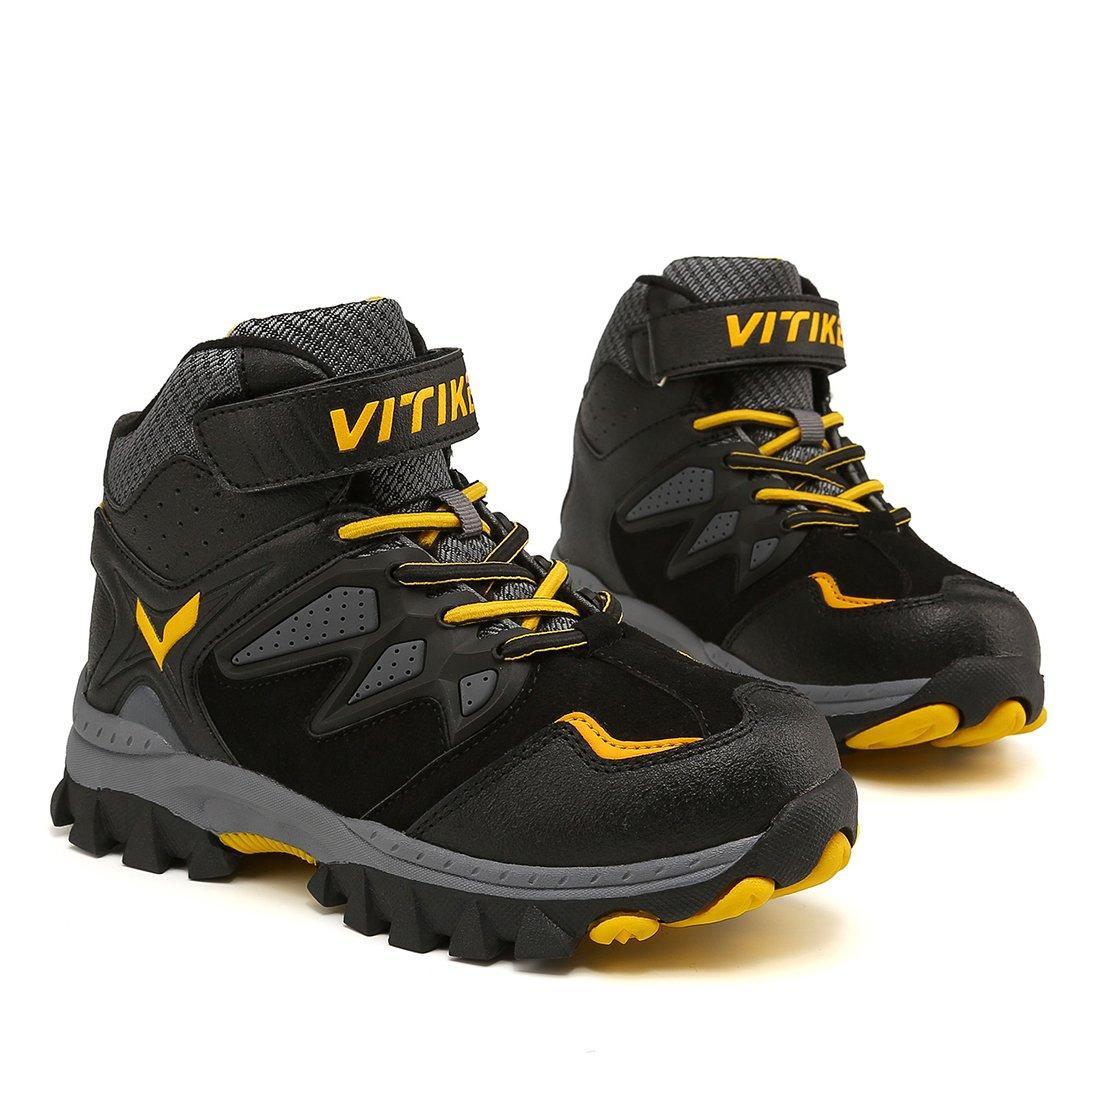 Boots Boys Winter Snow Sneakers Girls Hiking Trekking Outdoor Shoes Youth Big Little Kids Waterproof Non-Slip Steel Buckle by WETIKE (Image #5)